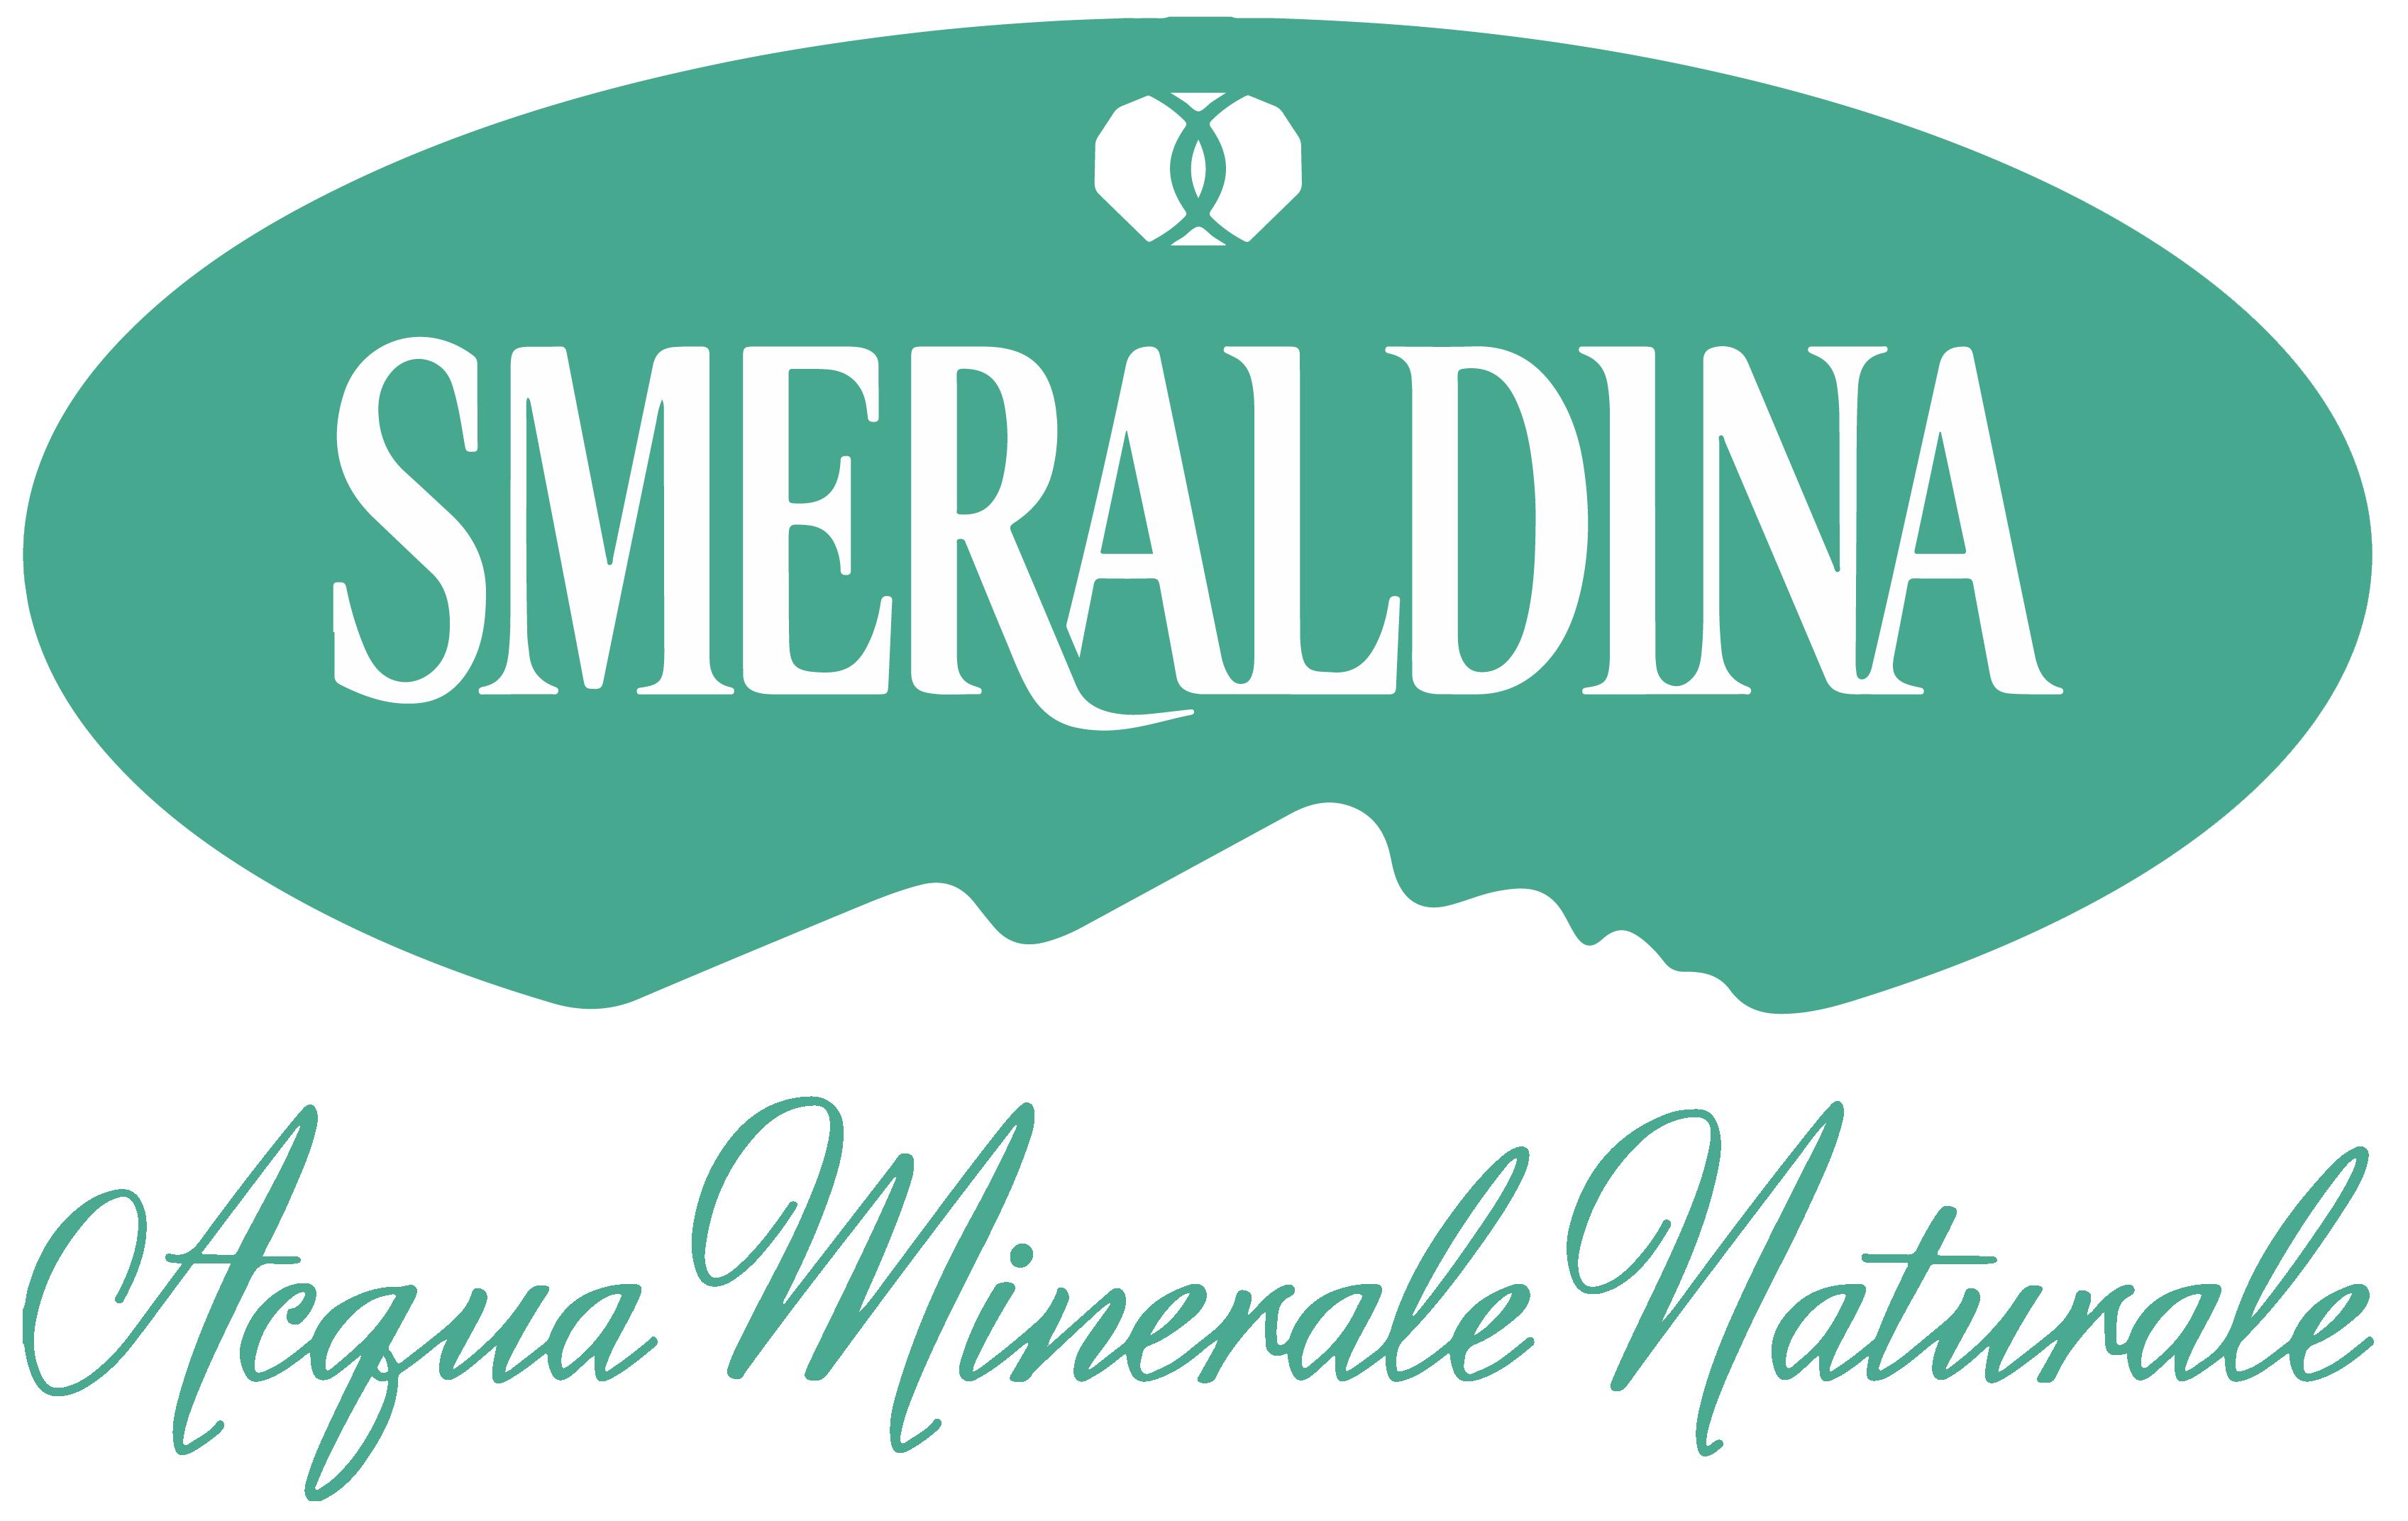 Smeraldina-01